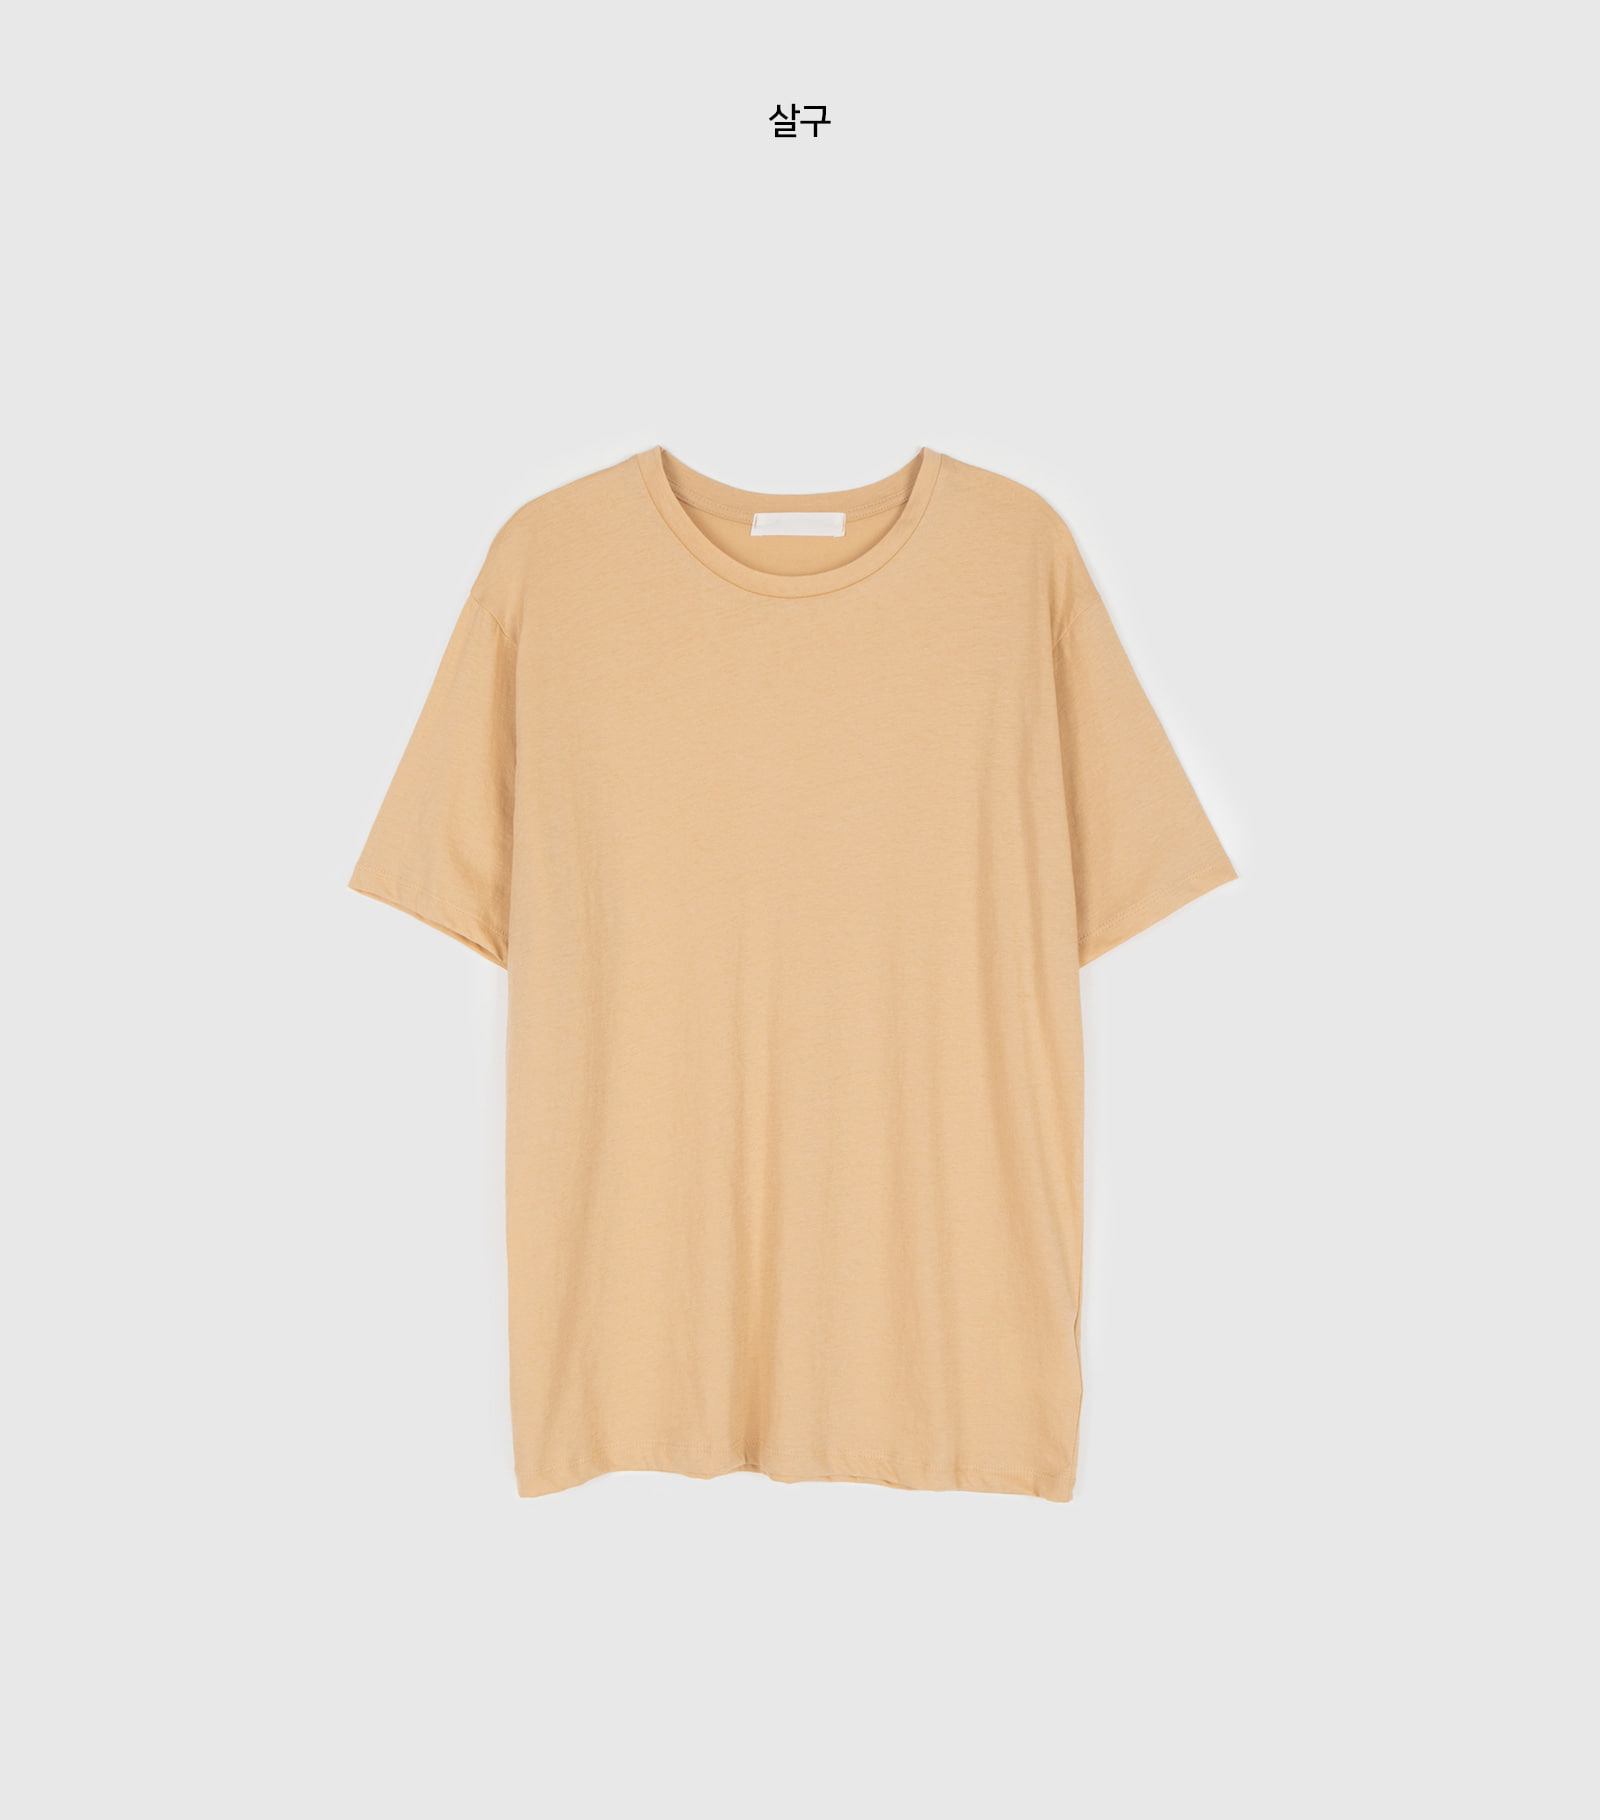 West Over Round Neck T-Shirt